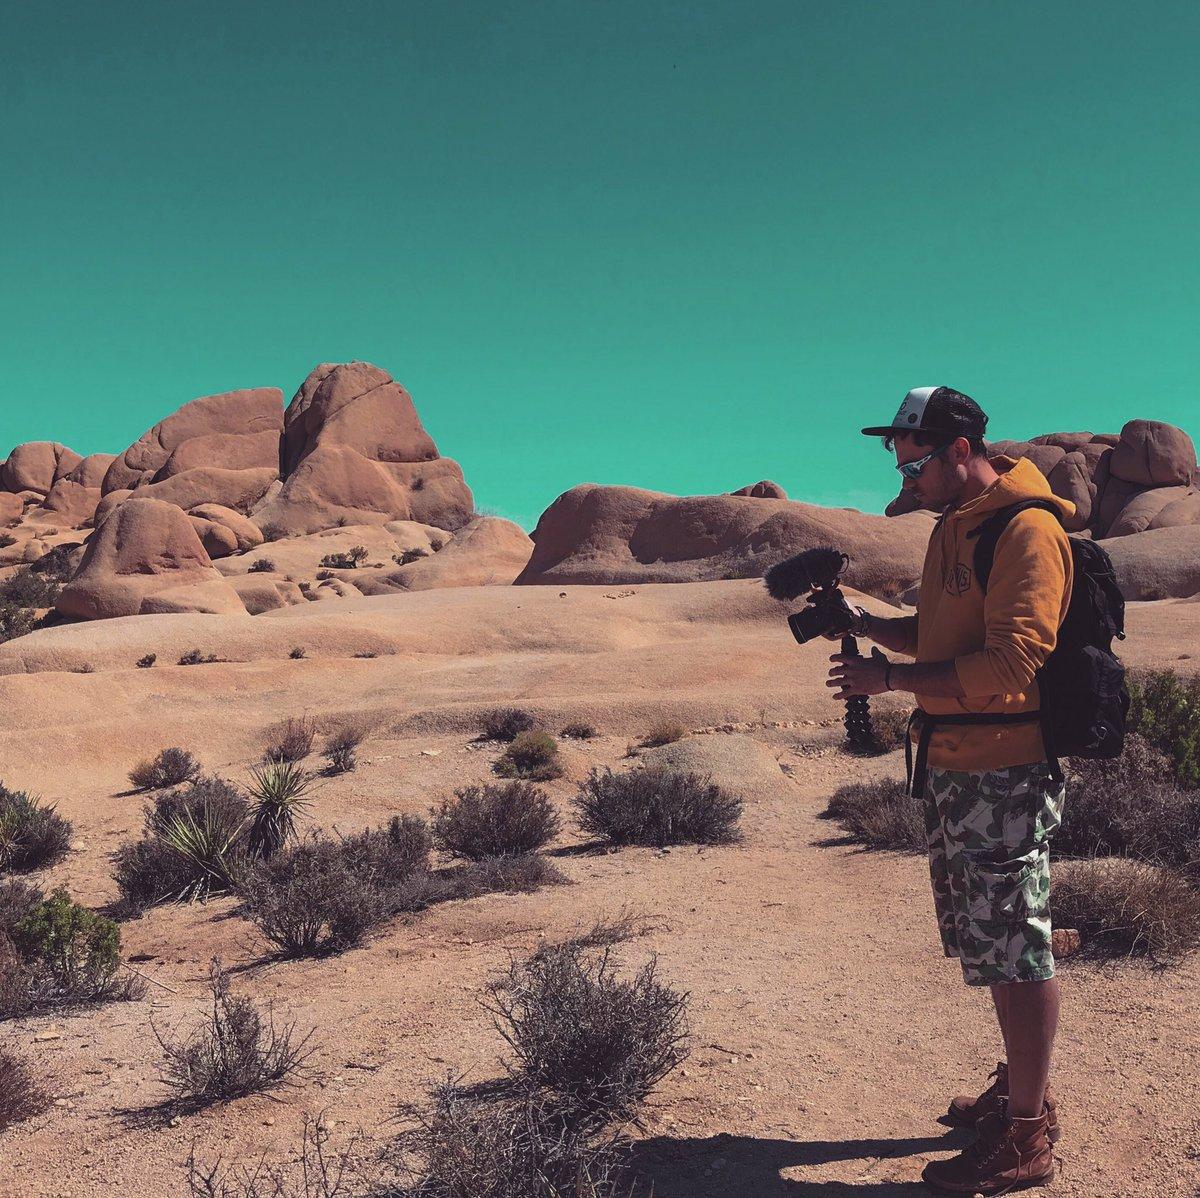 Filming in Joshua Tree National Park, CA . . . . #vasilismanjuranis #joshuatree #joshuatreenationalpark #joshuatreebouldering #thejoshuatree #filming #greekyoutuber #greekvloggers #greekvlogger #travelblogger #traveling #solotraveler #traveler #travel  #california #nationalparks